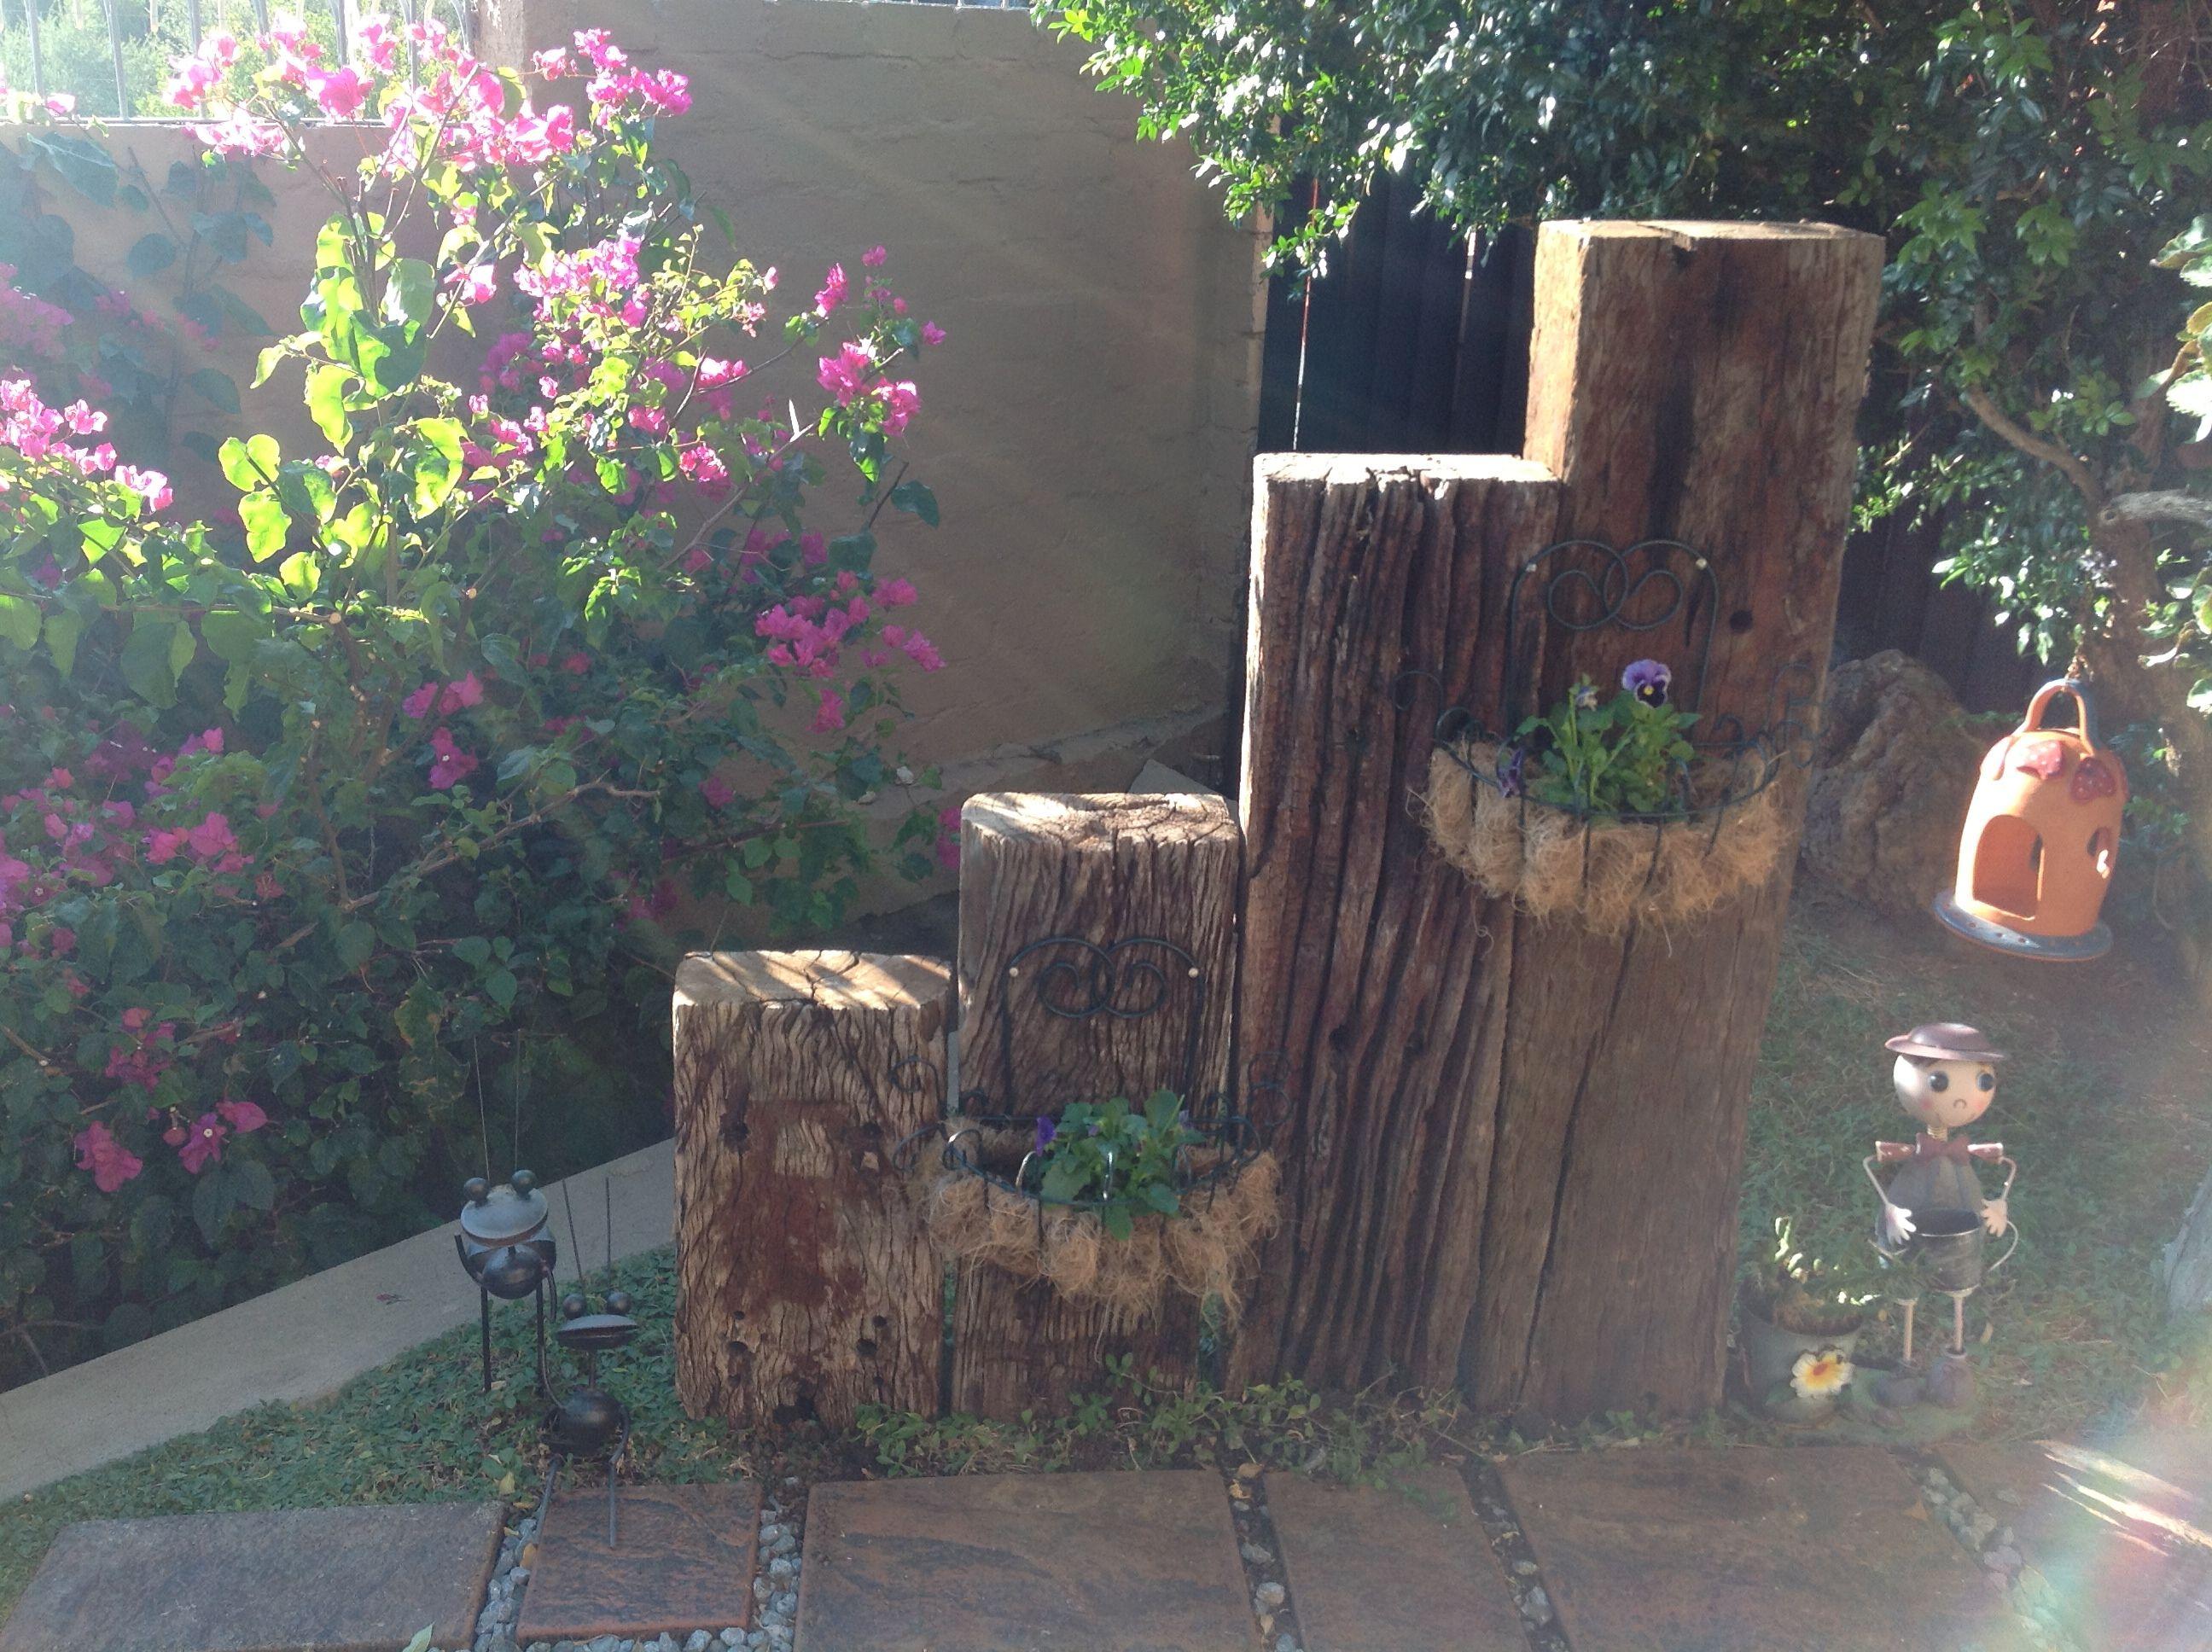 Up Cycle Idea For Old Railway Sleepers -#fairy #garden